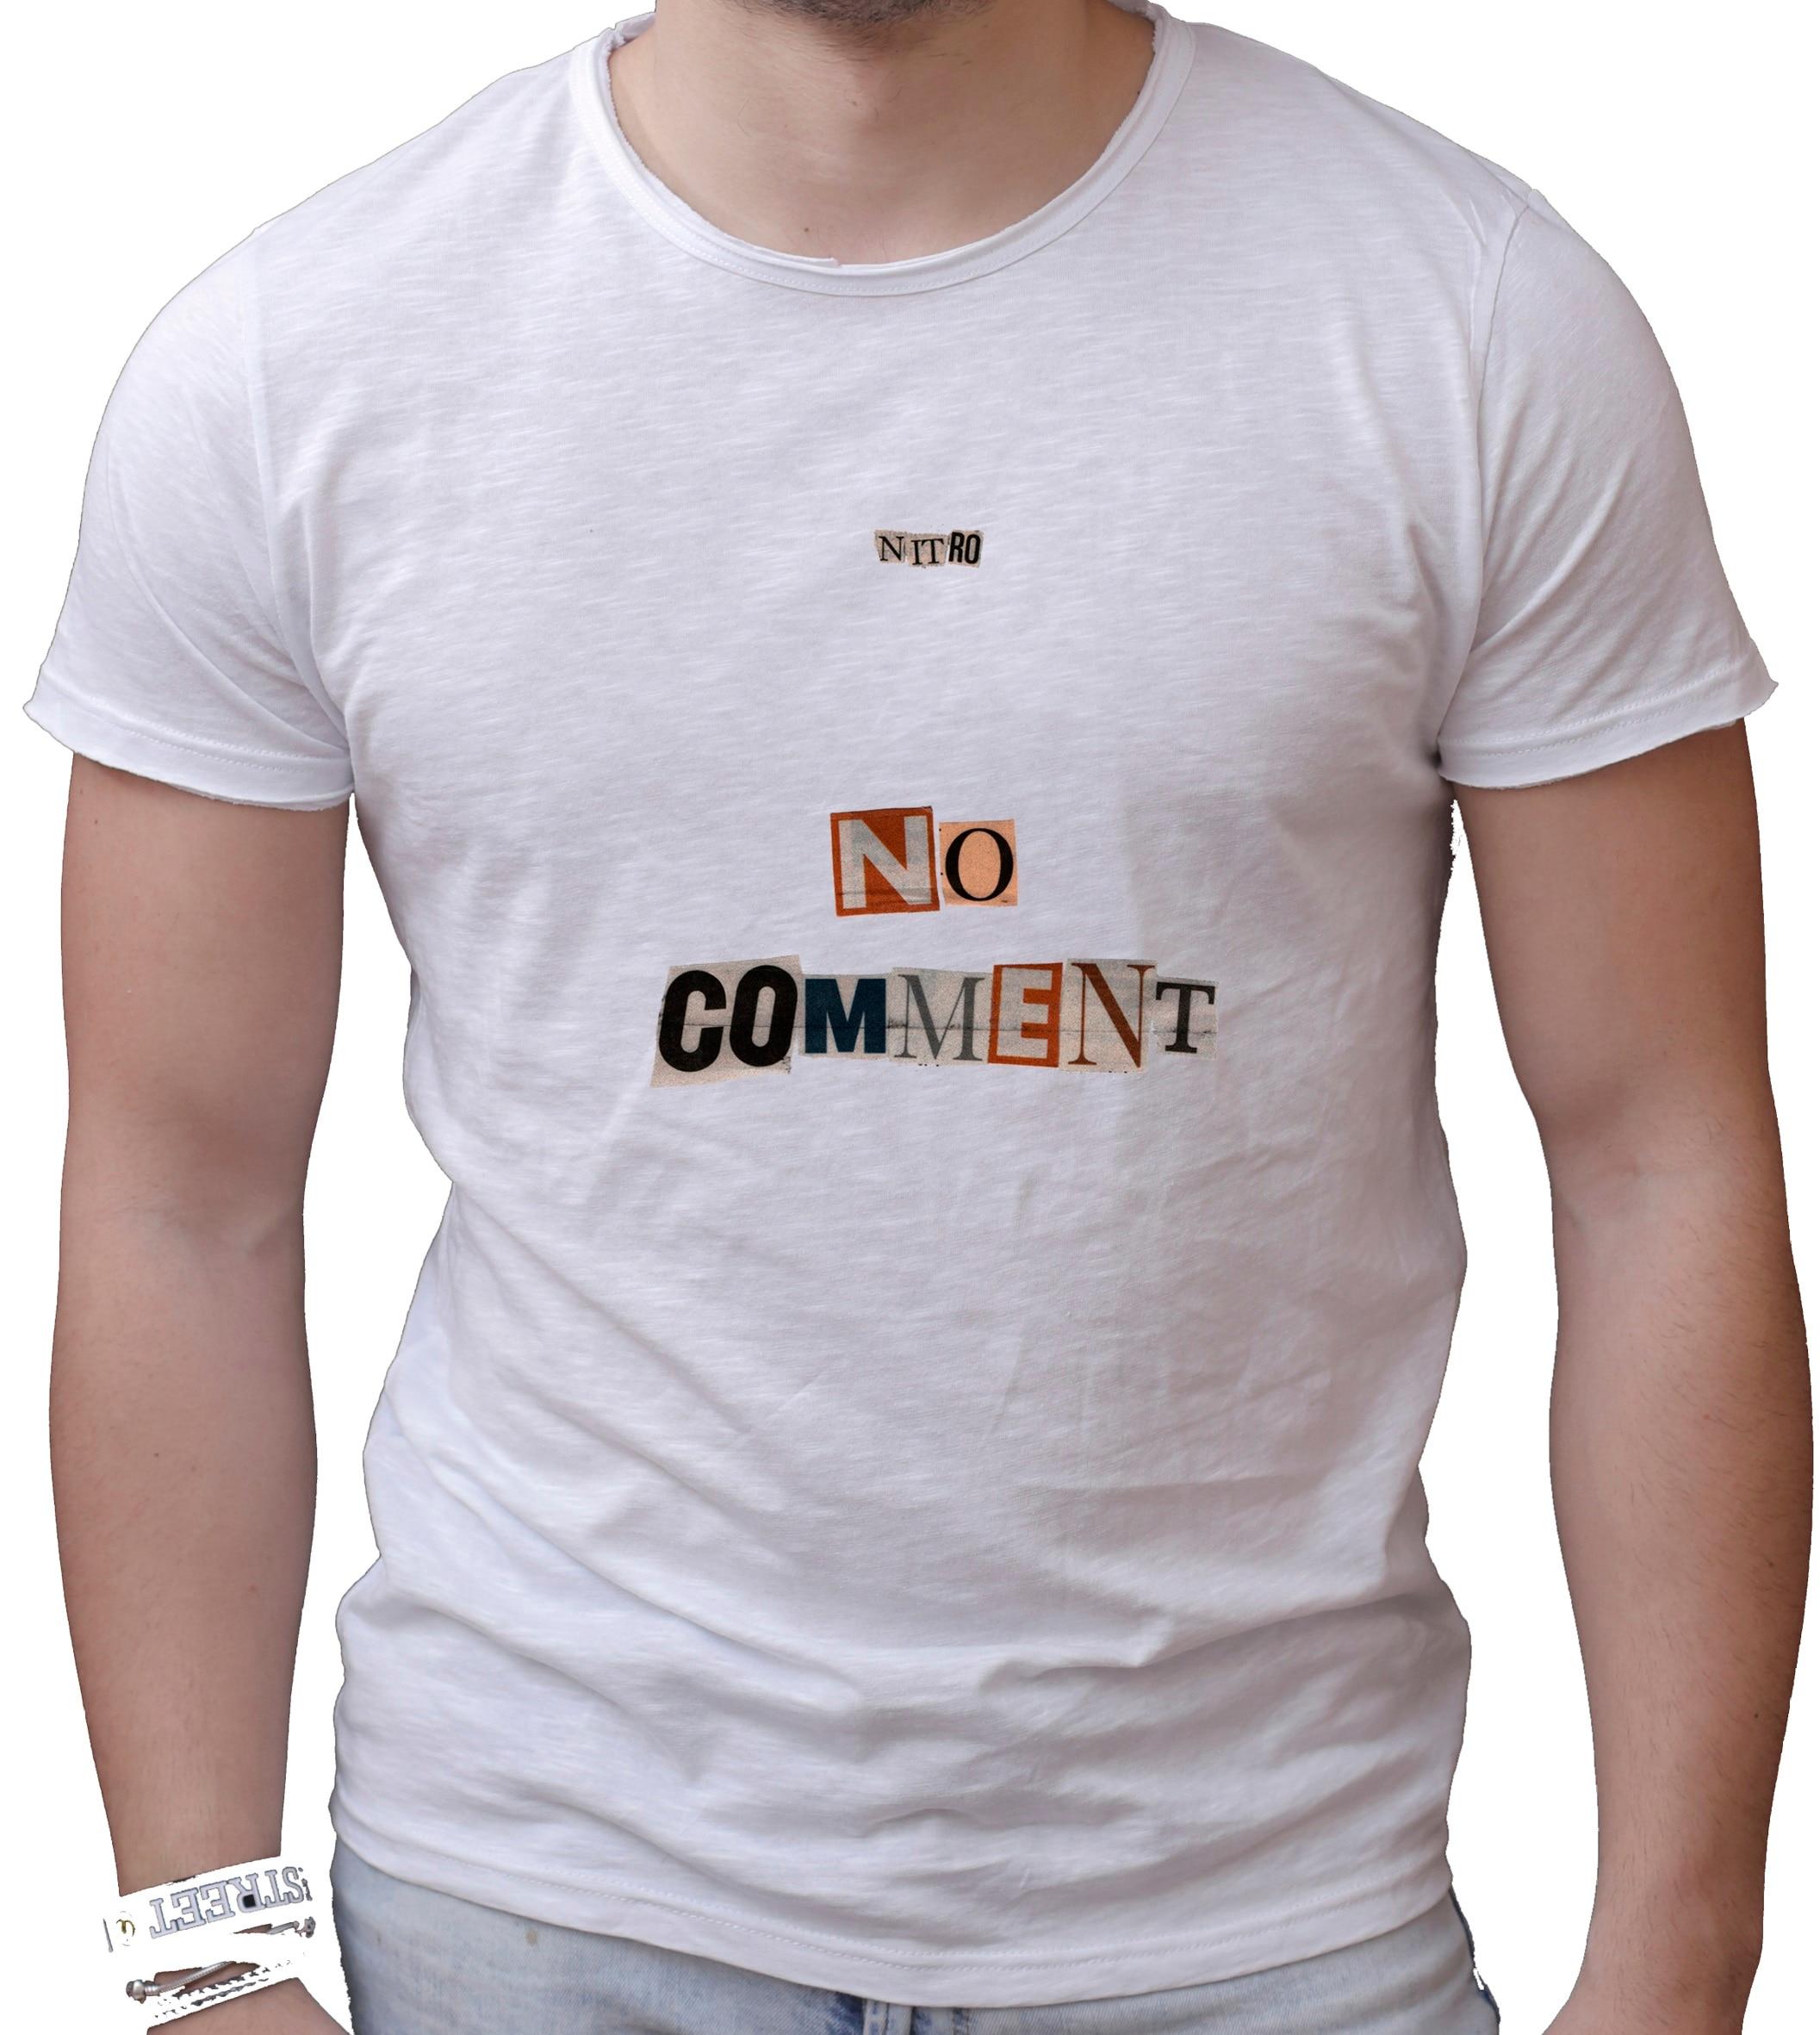 Camiseta Hombre algodón fiammato Scollo ampio-NITRO NO comentario MODELLO 2 hecho en Italia